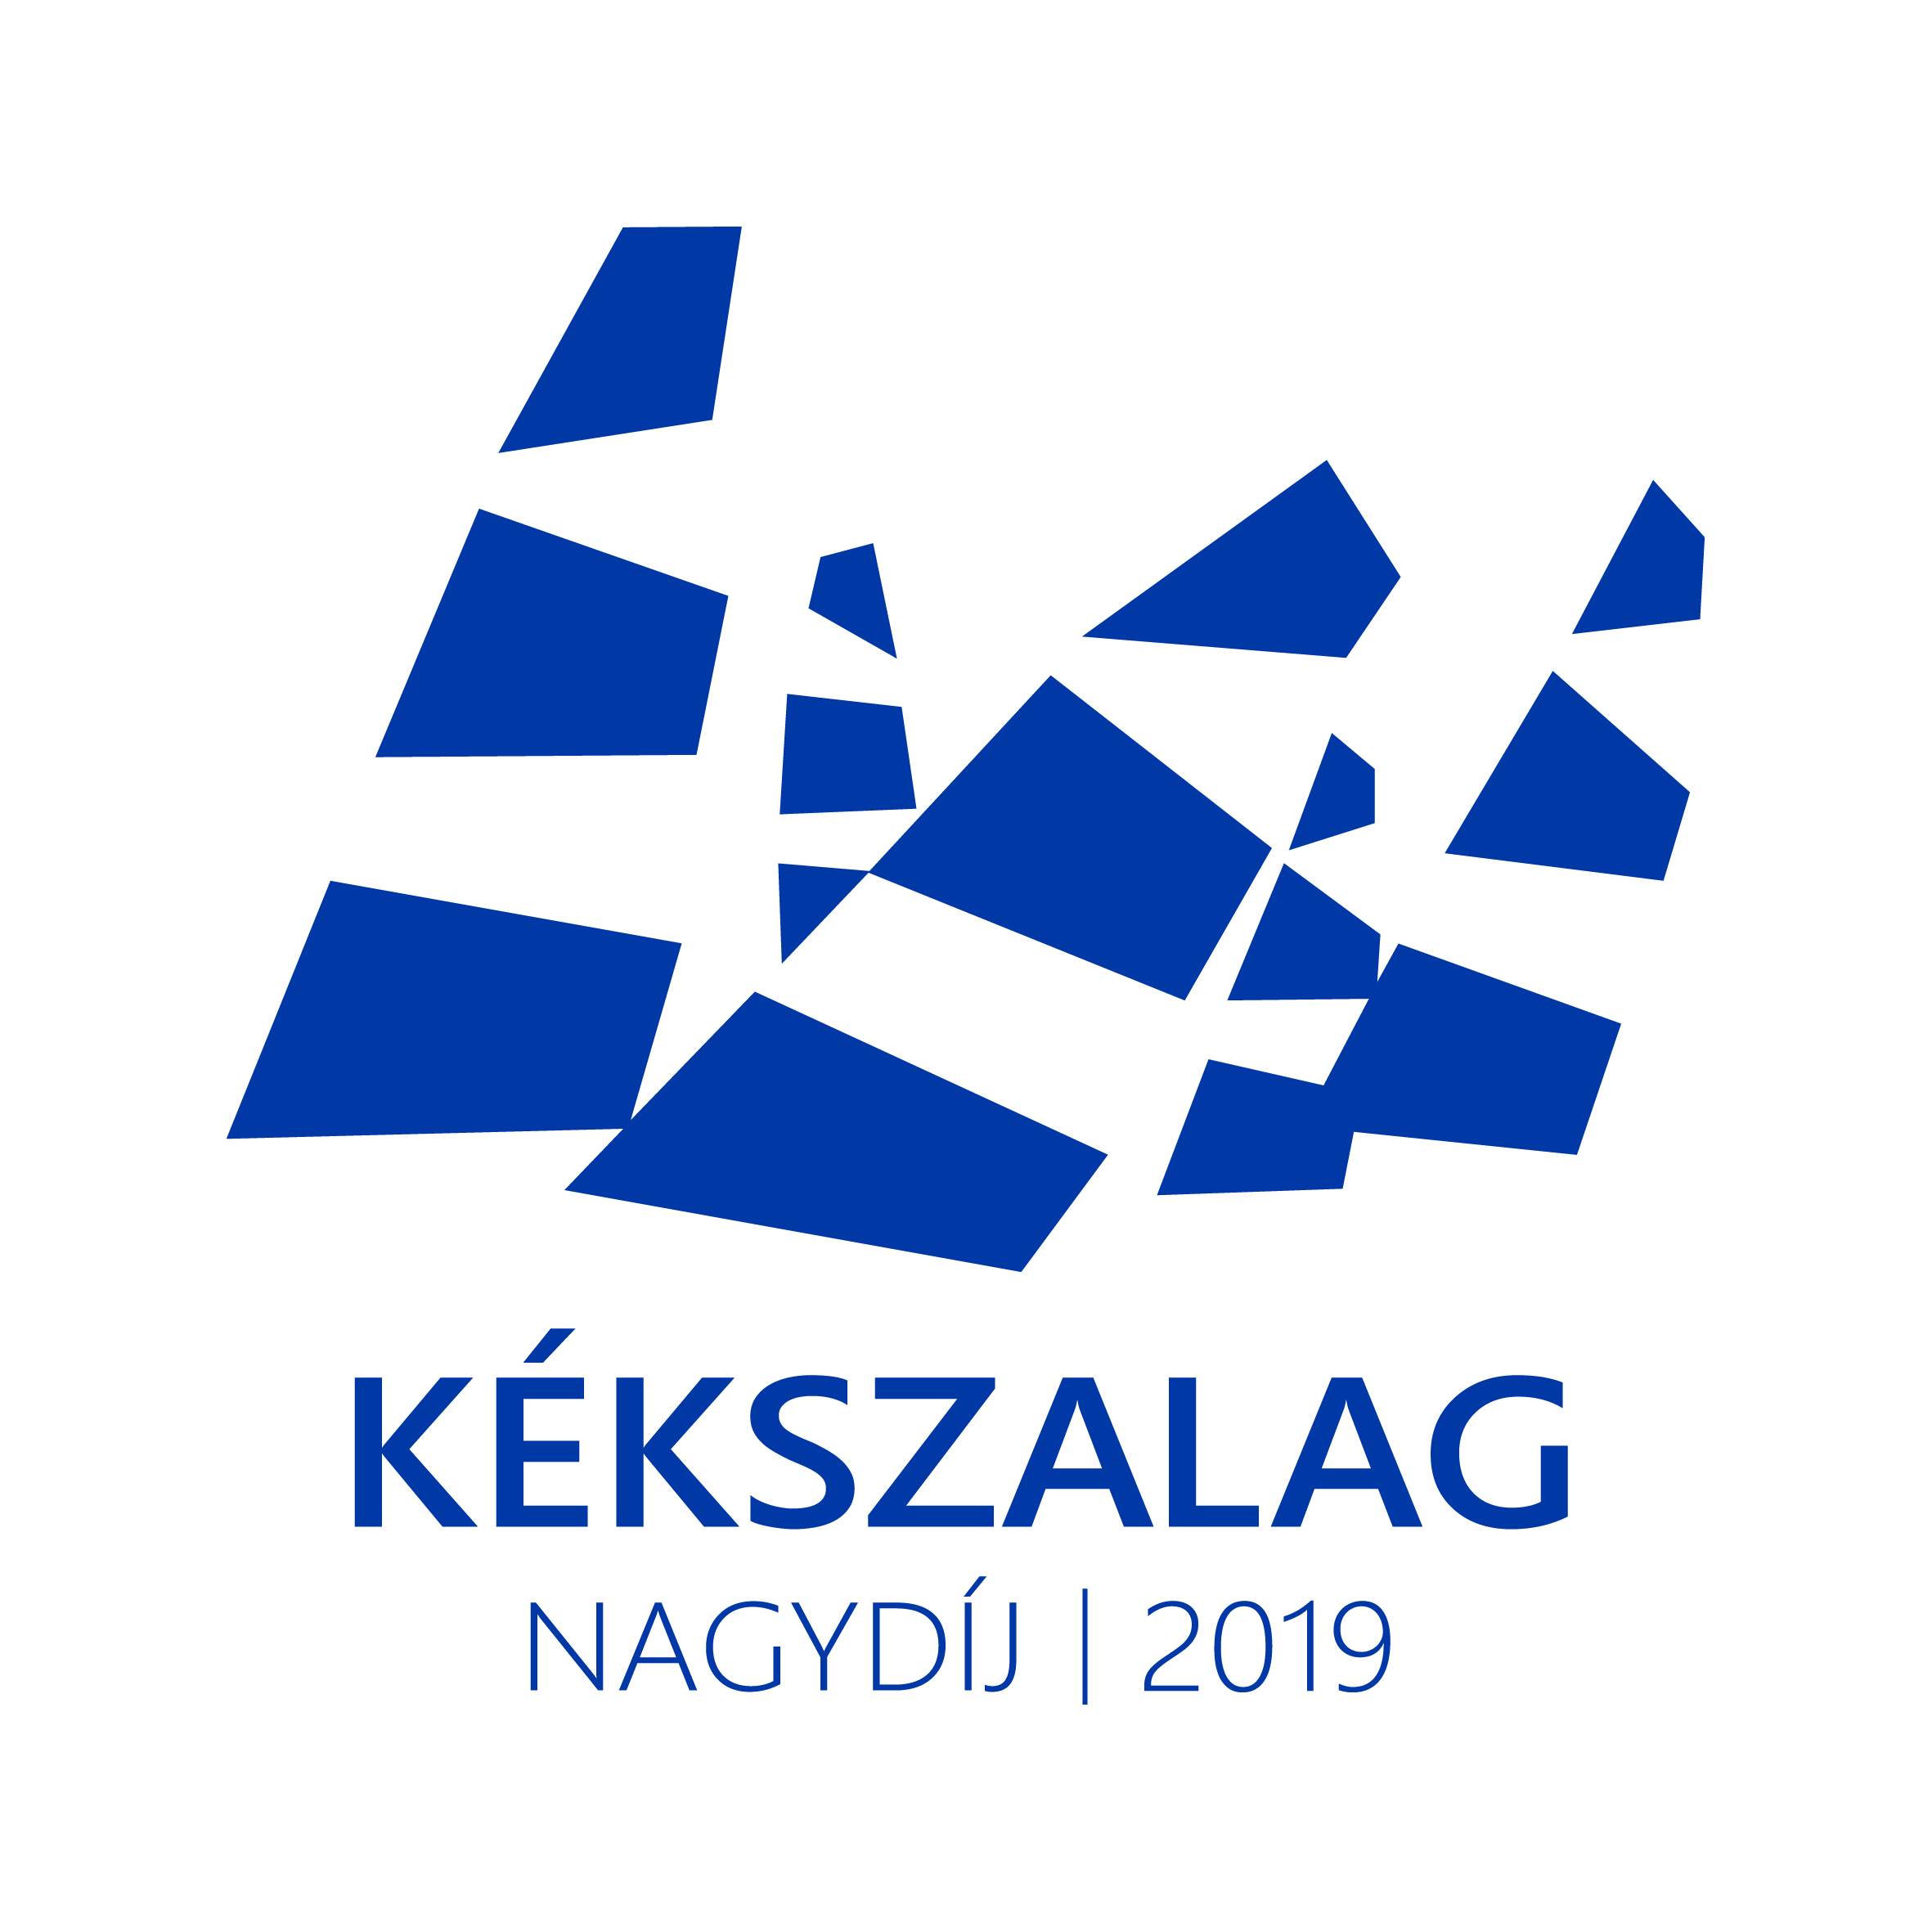 Kekszalag-erste-nagydij